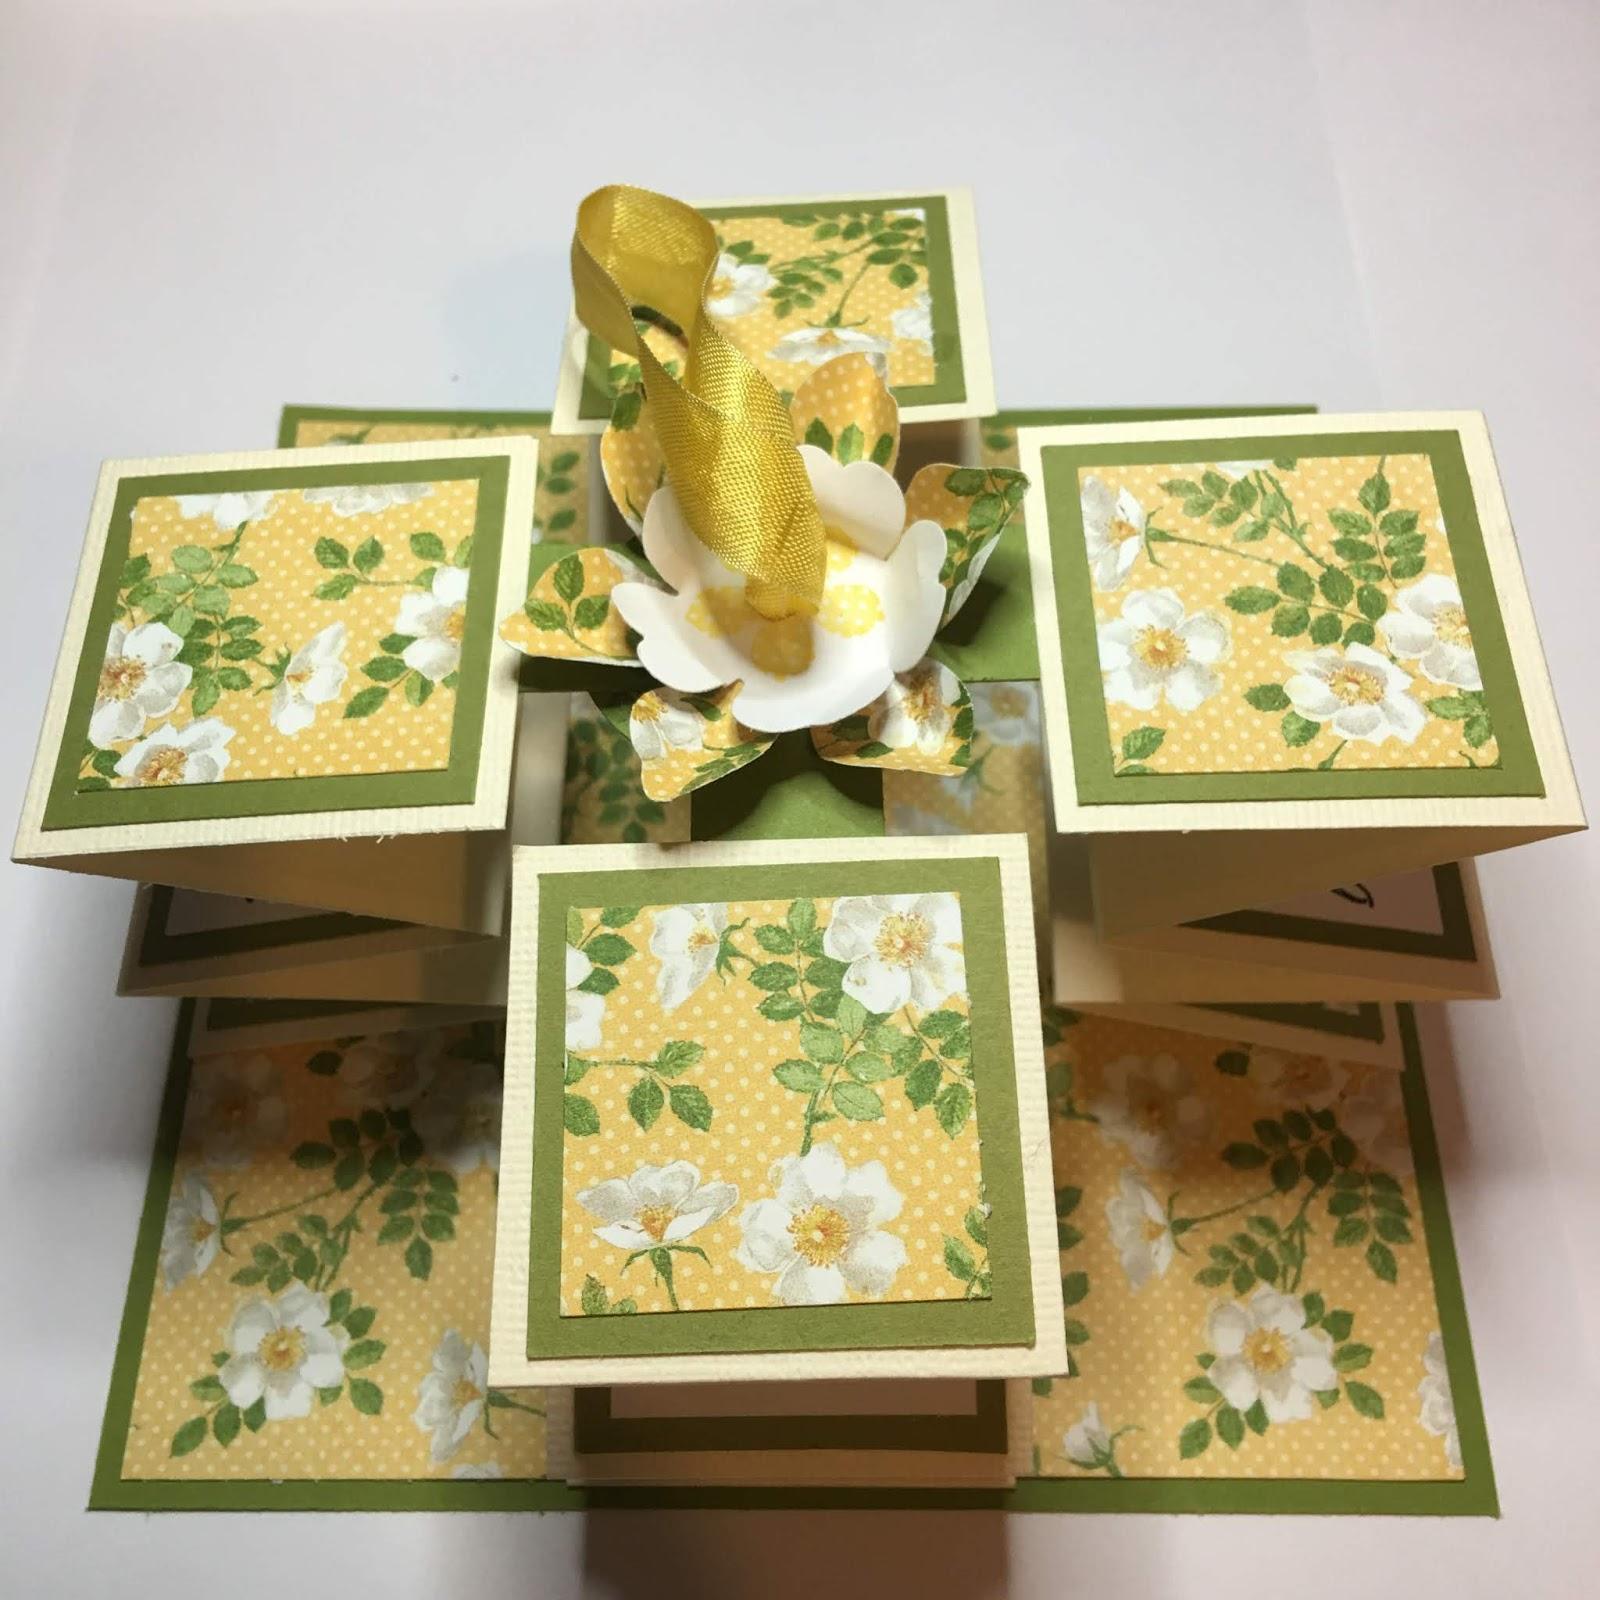 Birdcage craft studio pull up greetings card photo tutorial img8949g m4hsunfo